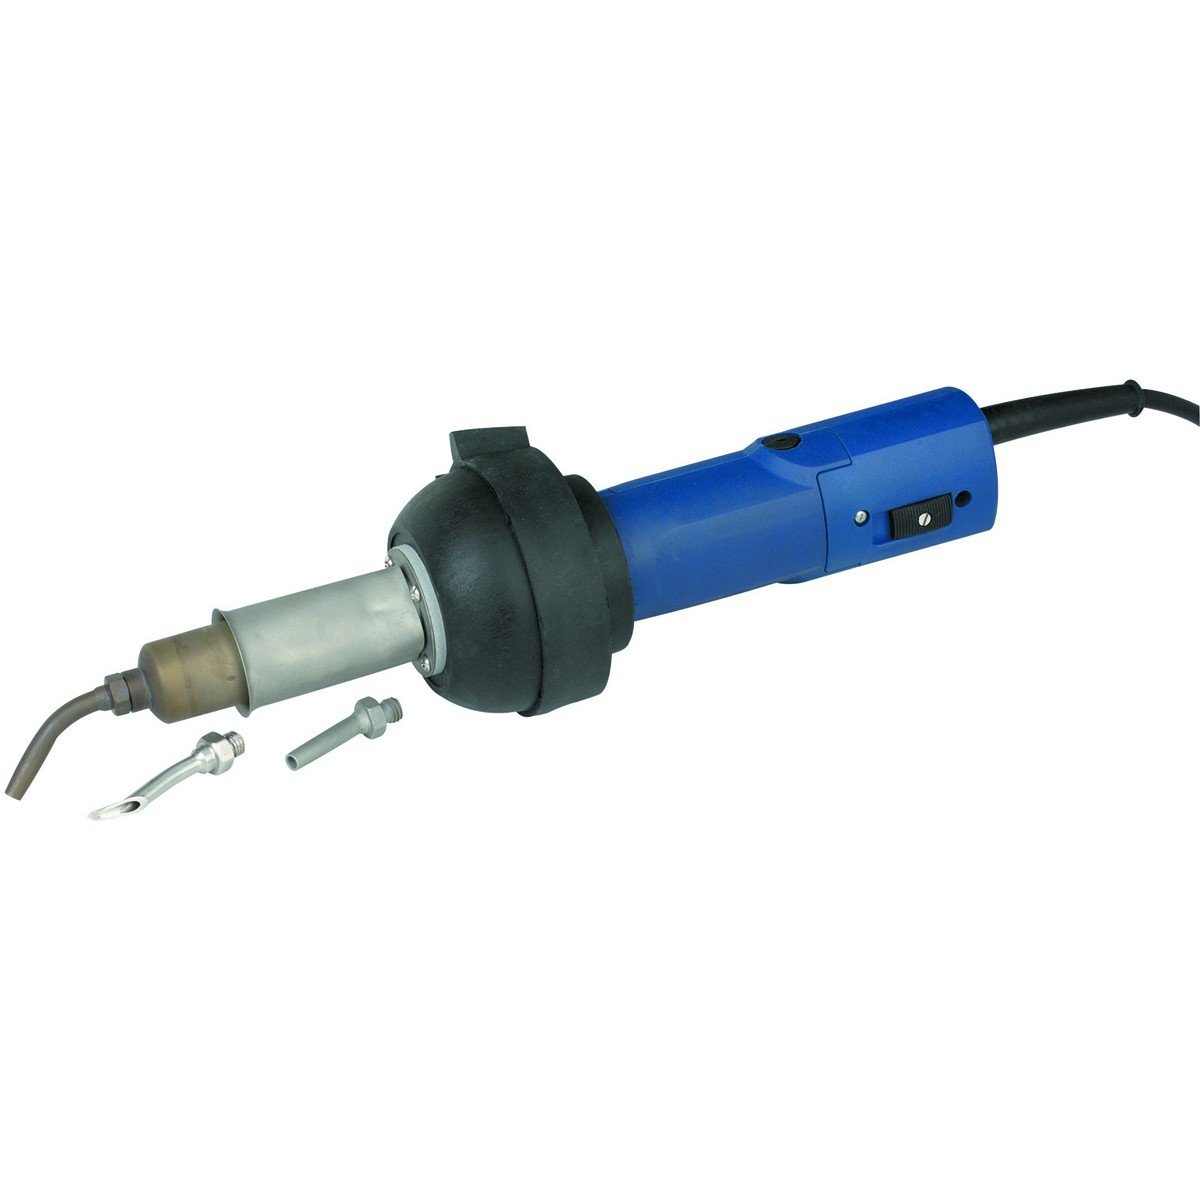 1300 Watt Plastic Welding Kit with Air Motor and Temperature Adjustment HFJ14